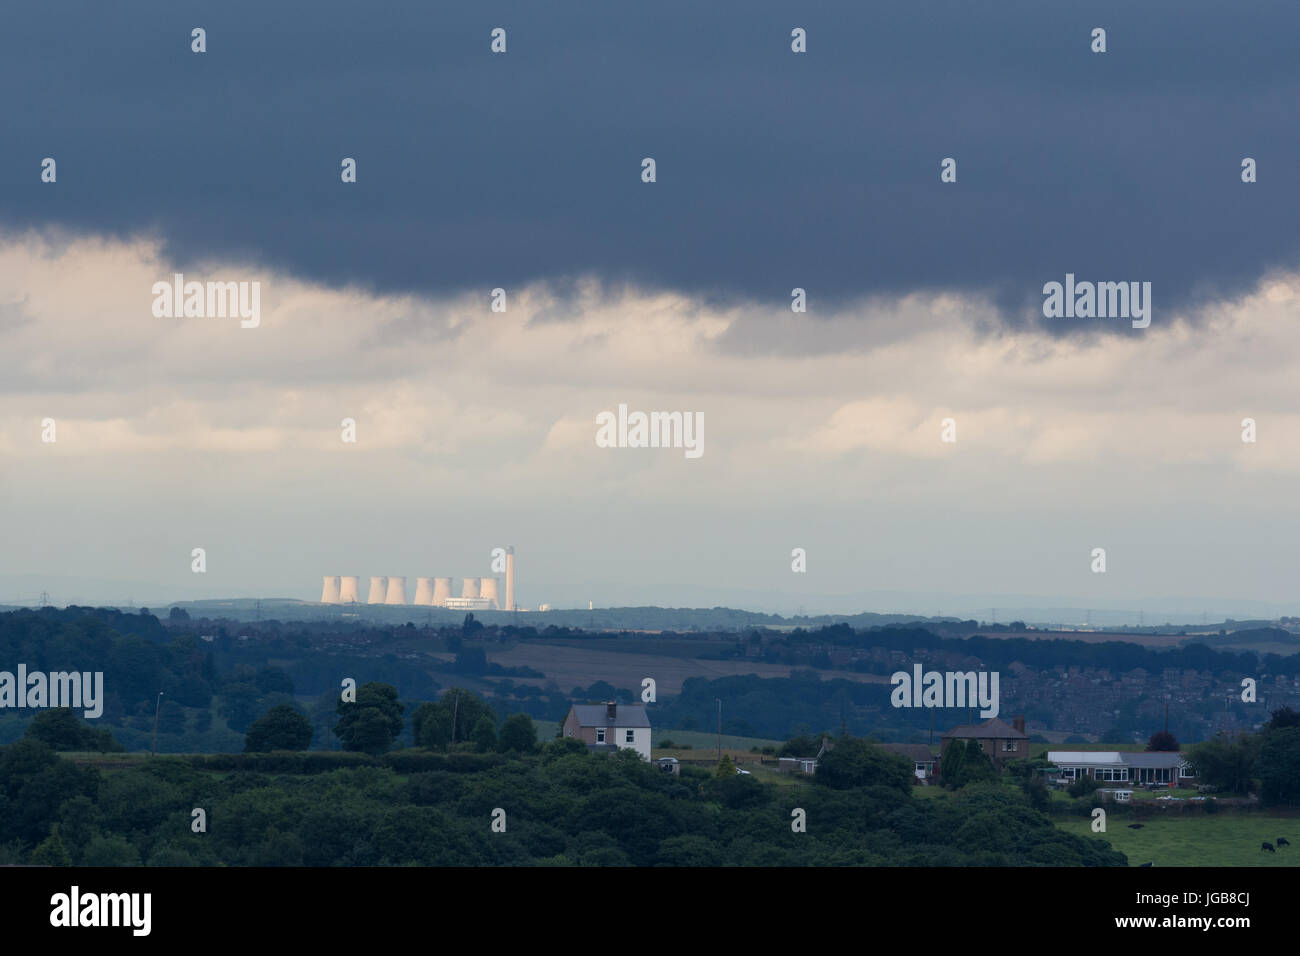 Eggborough Kohlekraftwerk Kraftwerk unter einem Gewitterhimmel, North Yorkshire, England, UK Stockbild